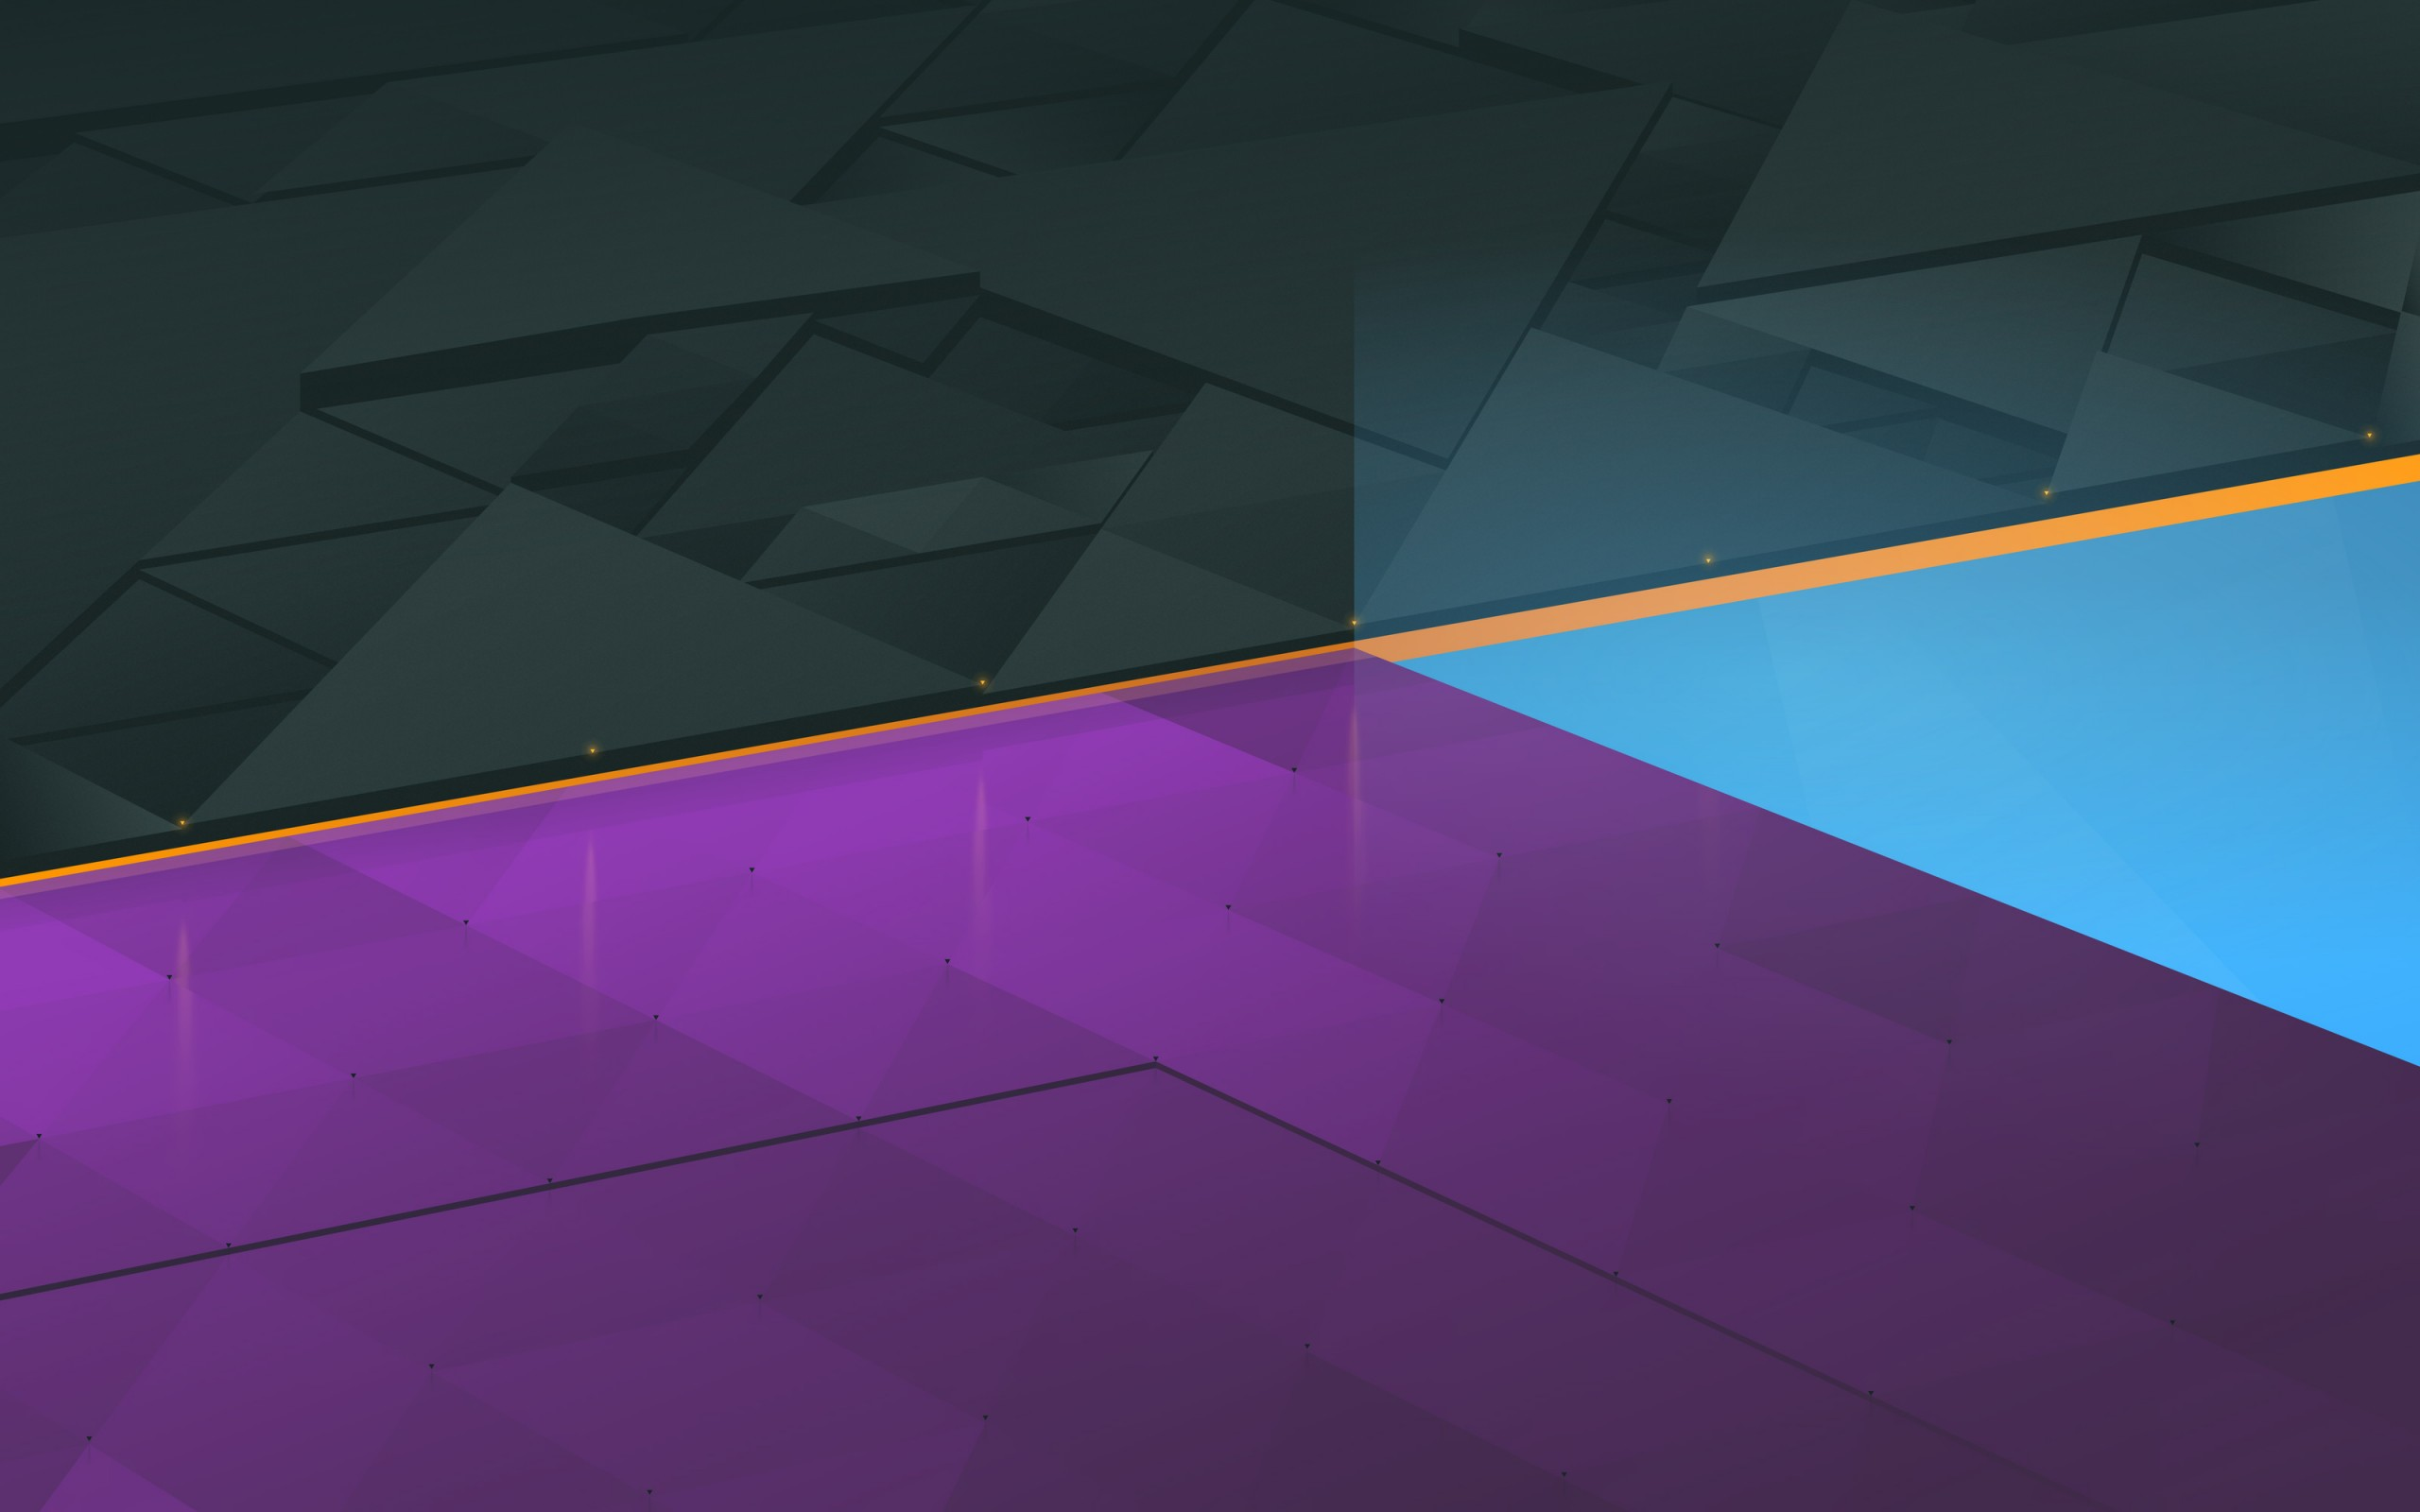 Download 3d Abstract Free Neon Colors Wallpaper 13 Retina